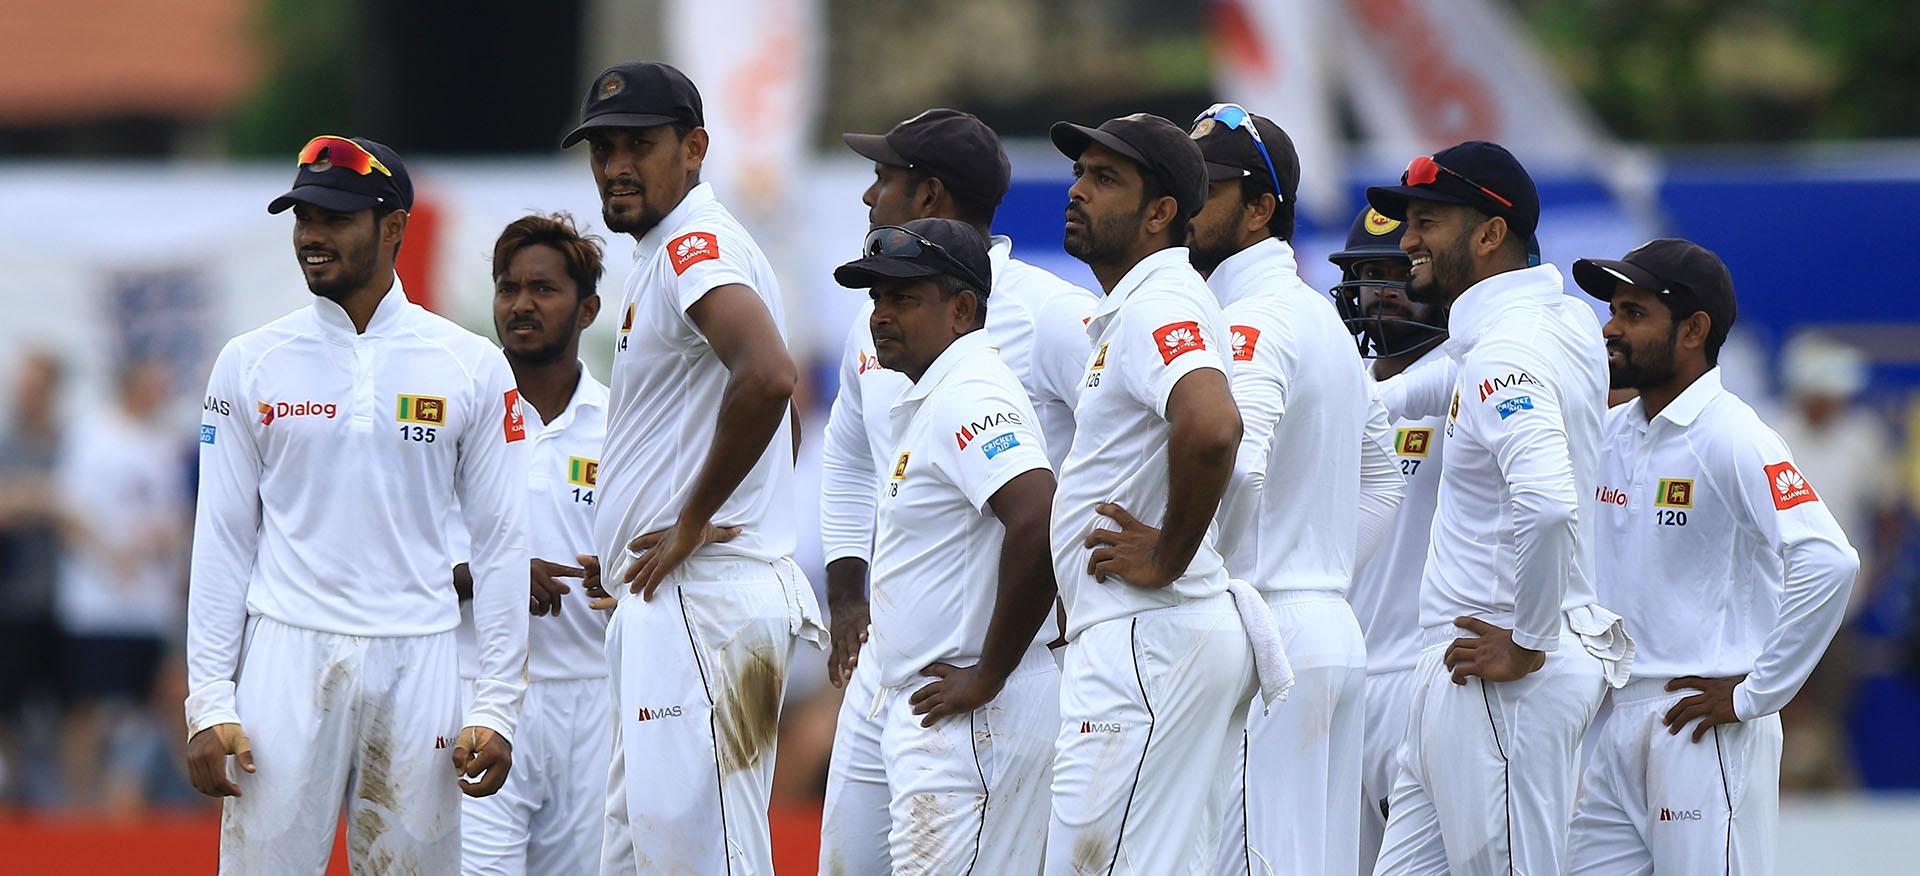 Sri Lanka's decline as a cricketing powerhouse is a cause for concern